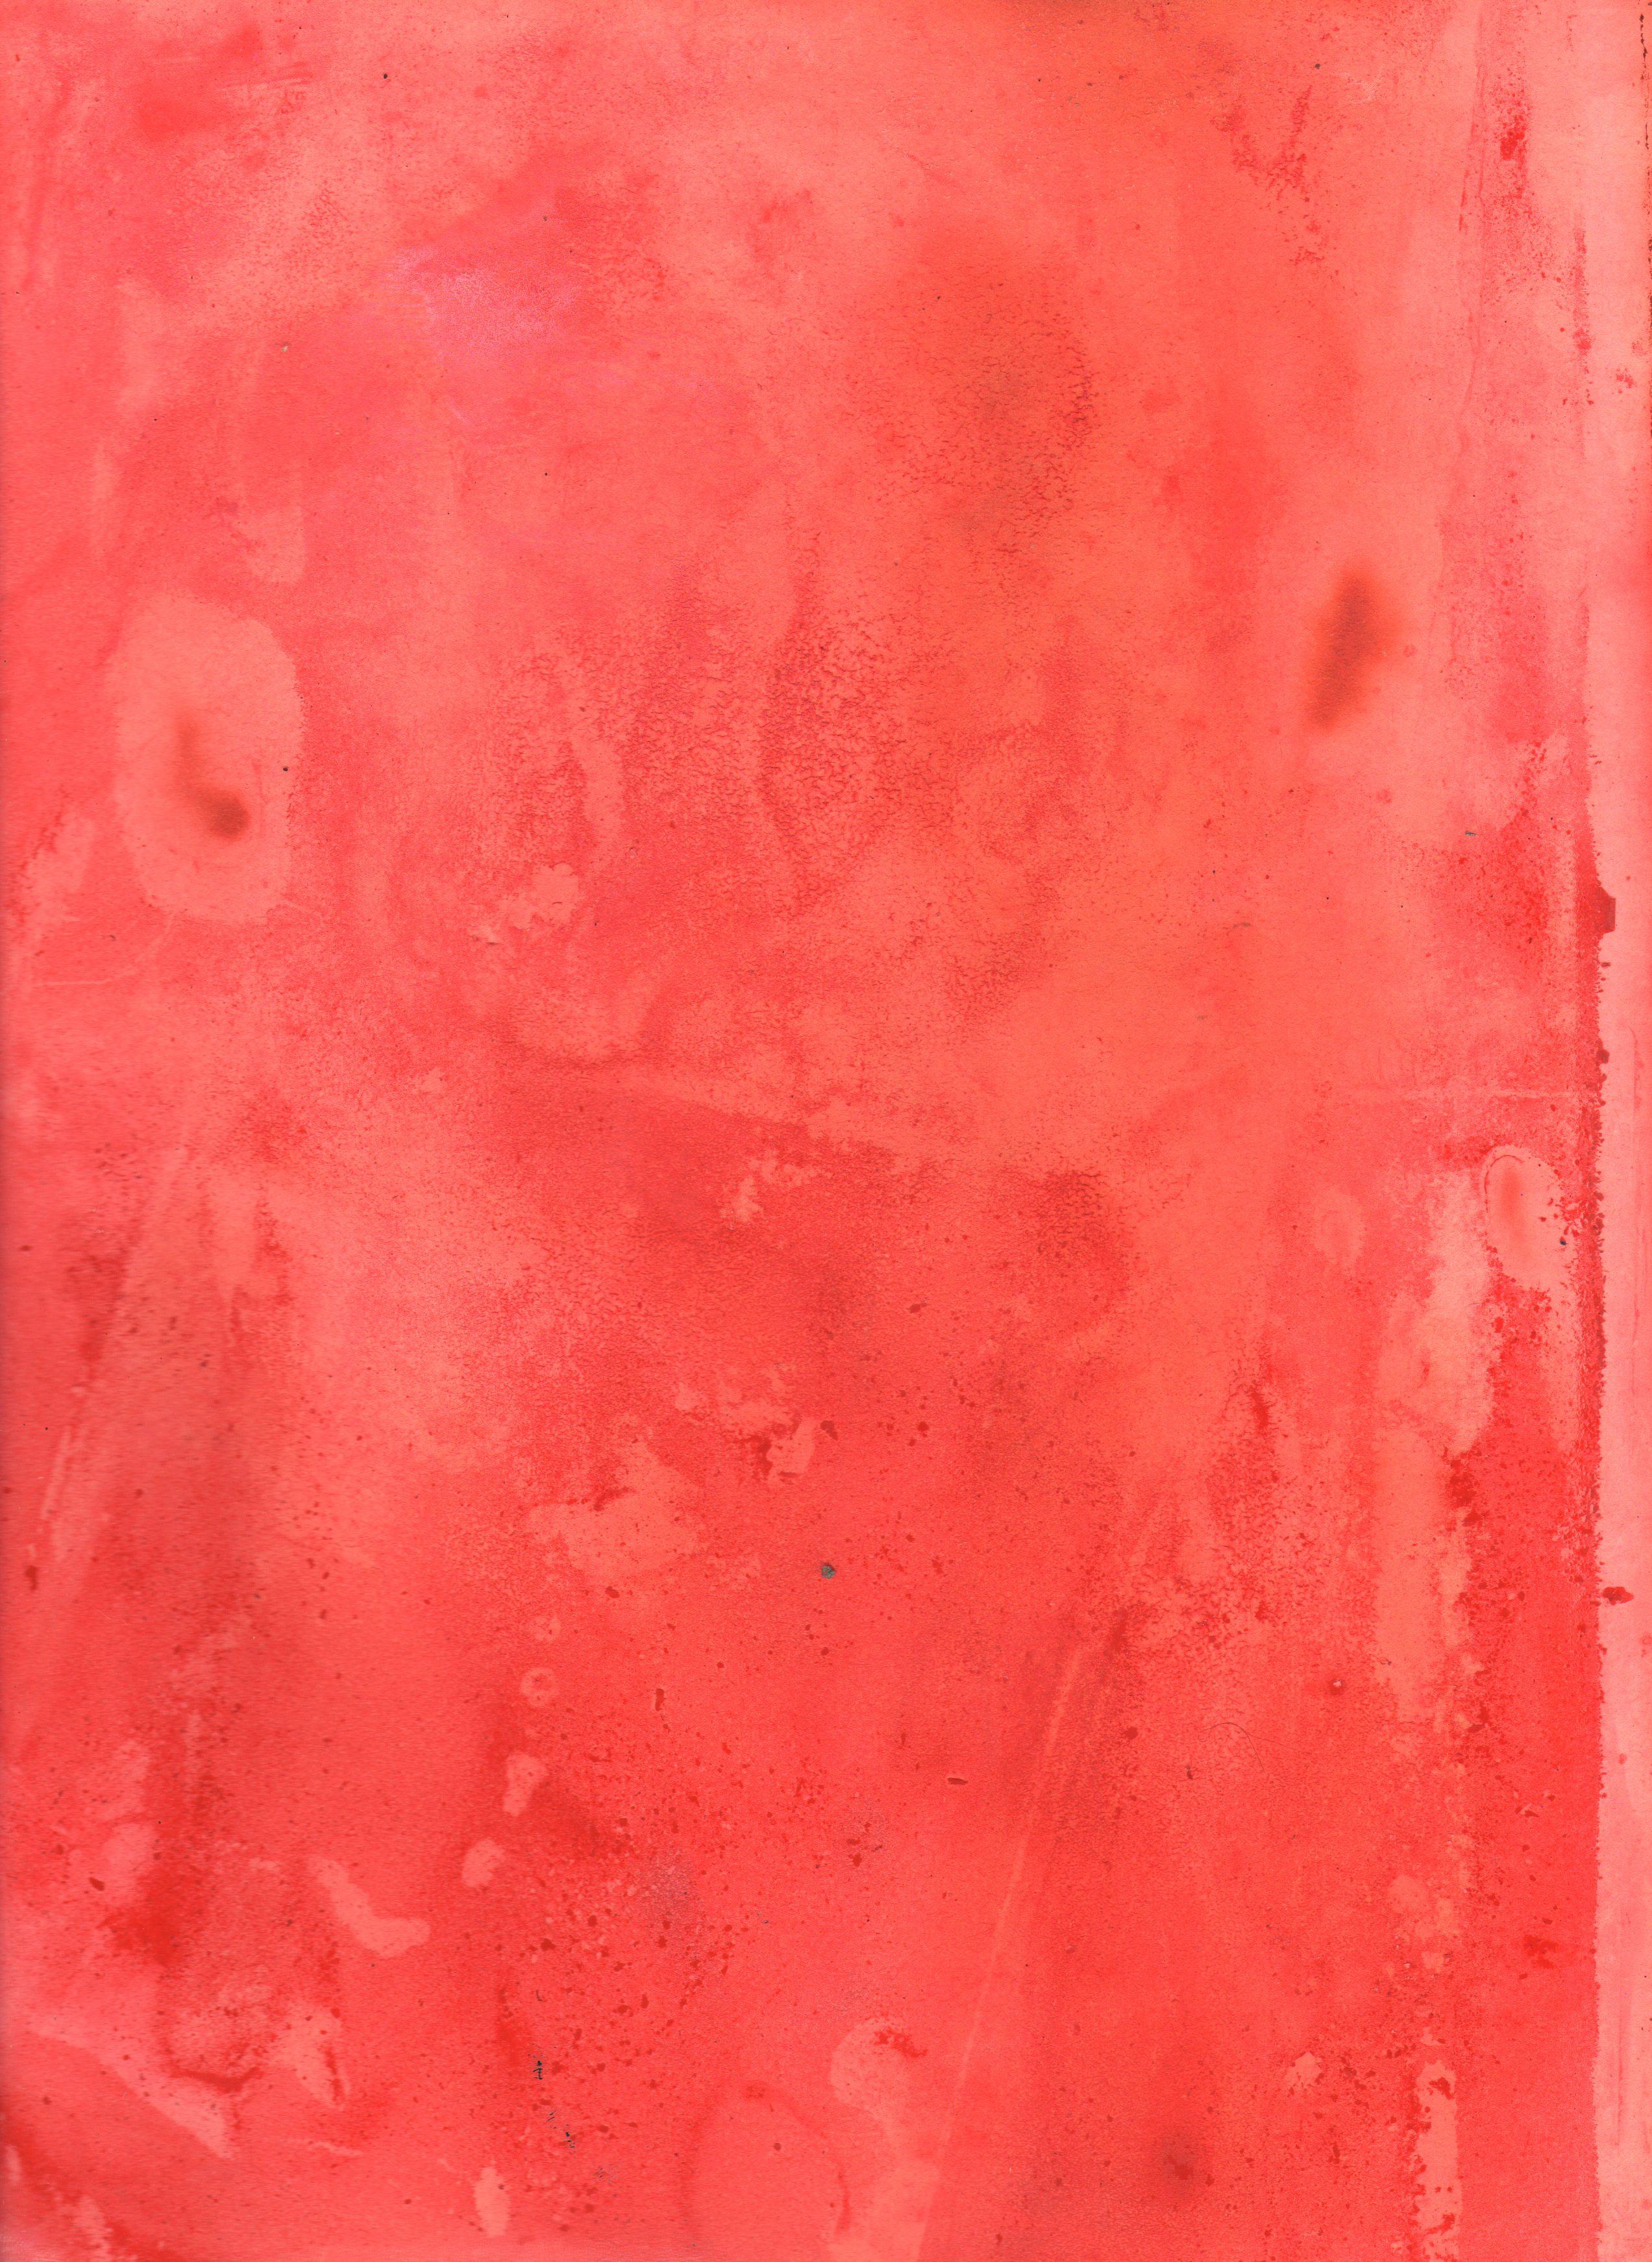 texture colour wallpaper: 16 Free Colorful Watercolor Textures